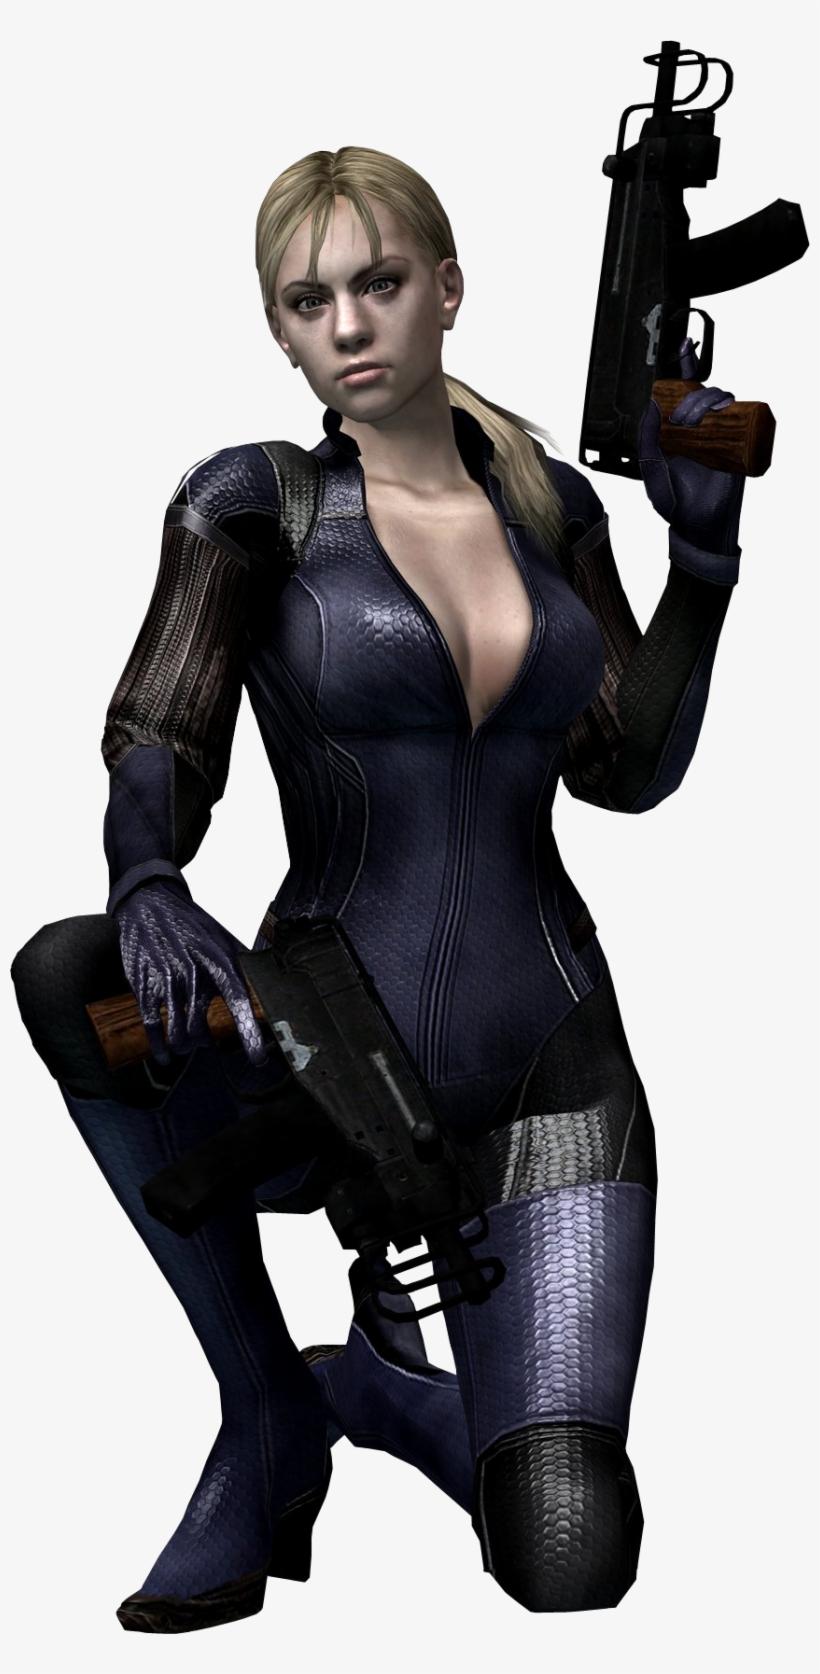 Jill Valentine Re5 Jill Valentine Resident Evil 5 Outfit